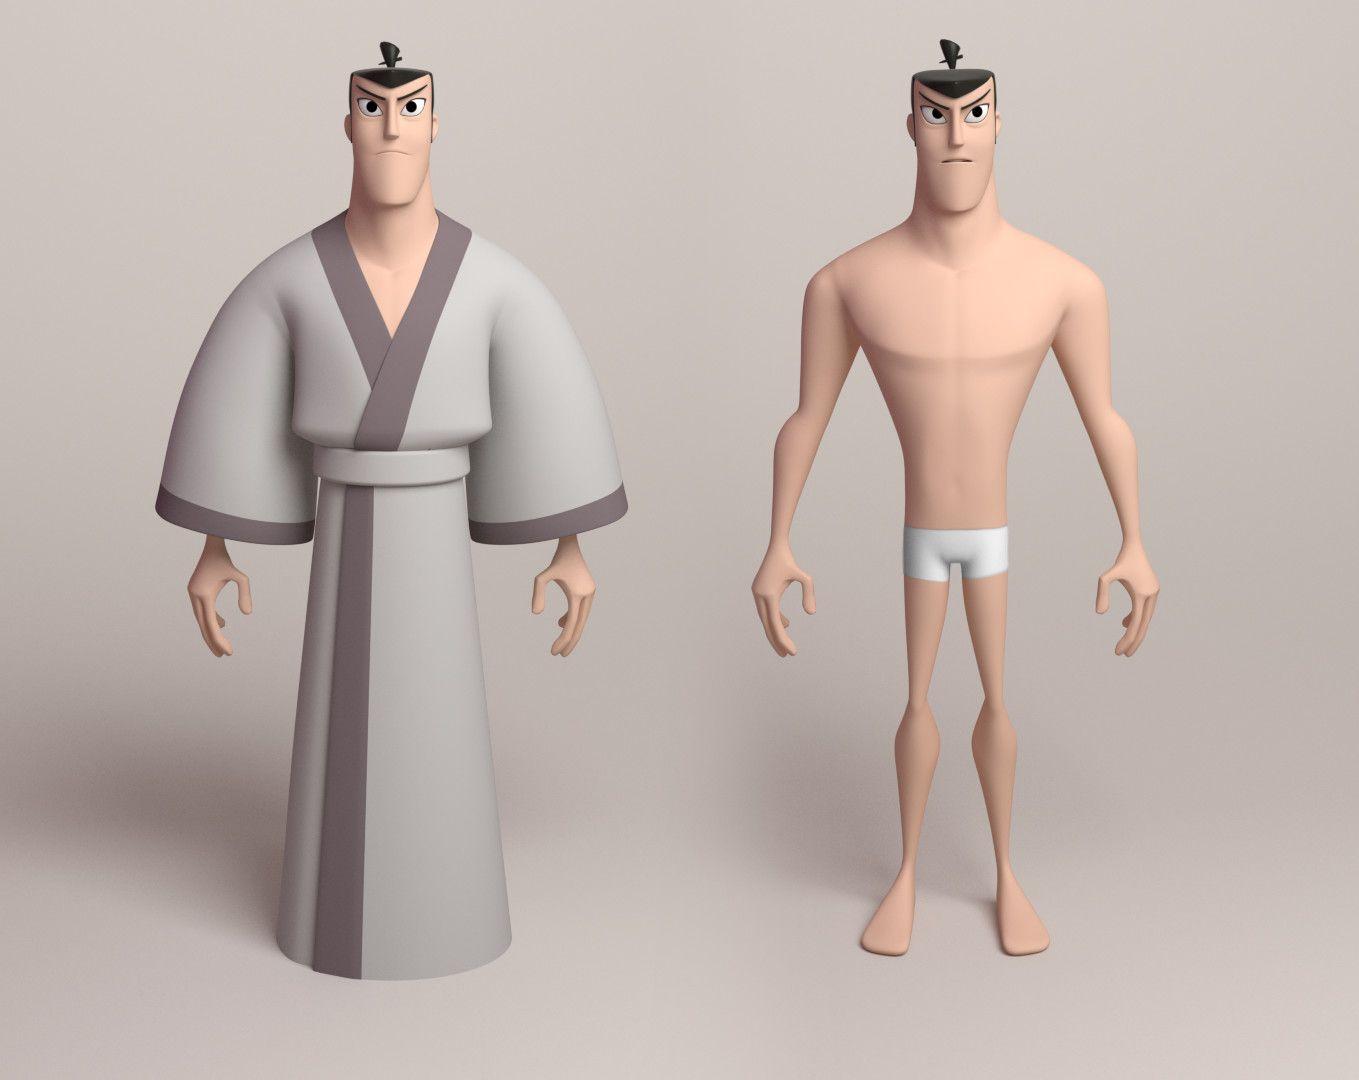 Artstation Samurai Jack Dann Beeson Modelos Personagem Em